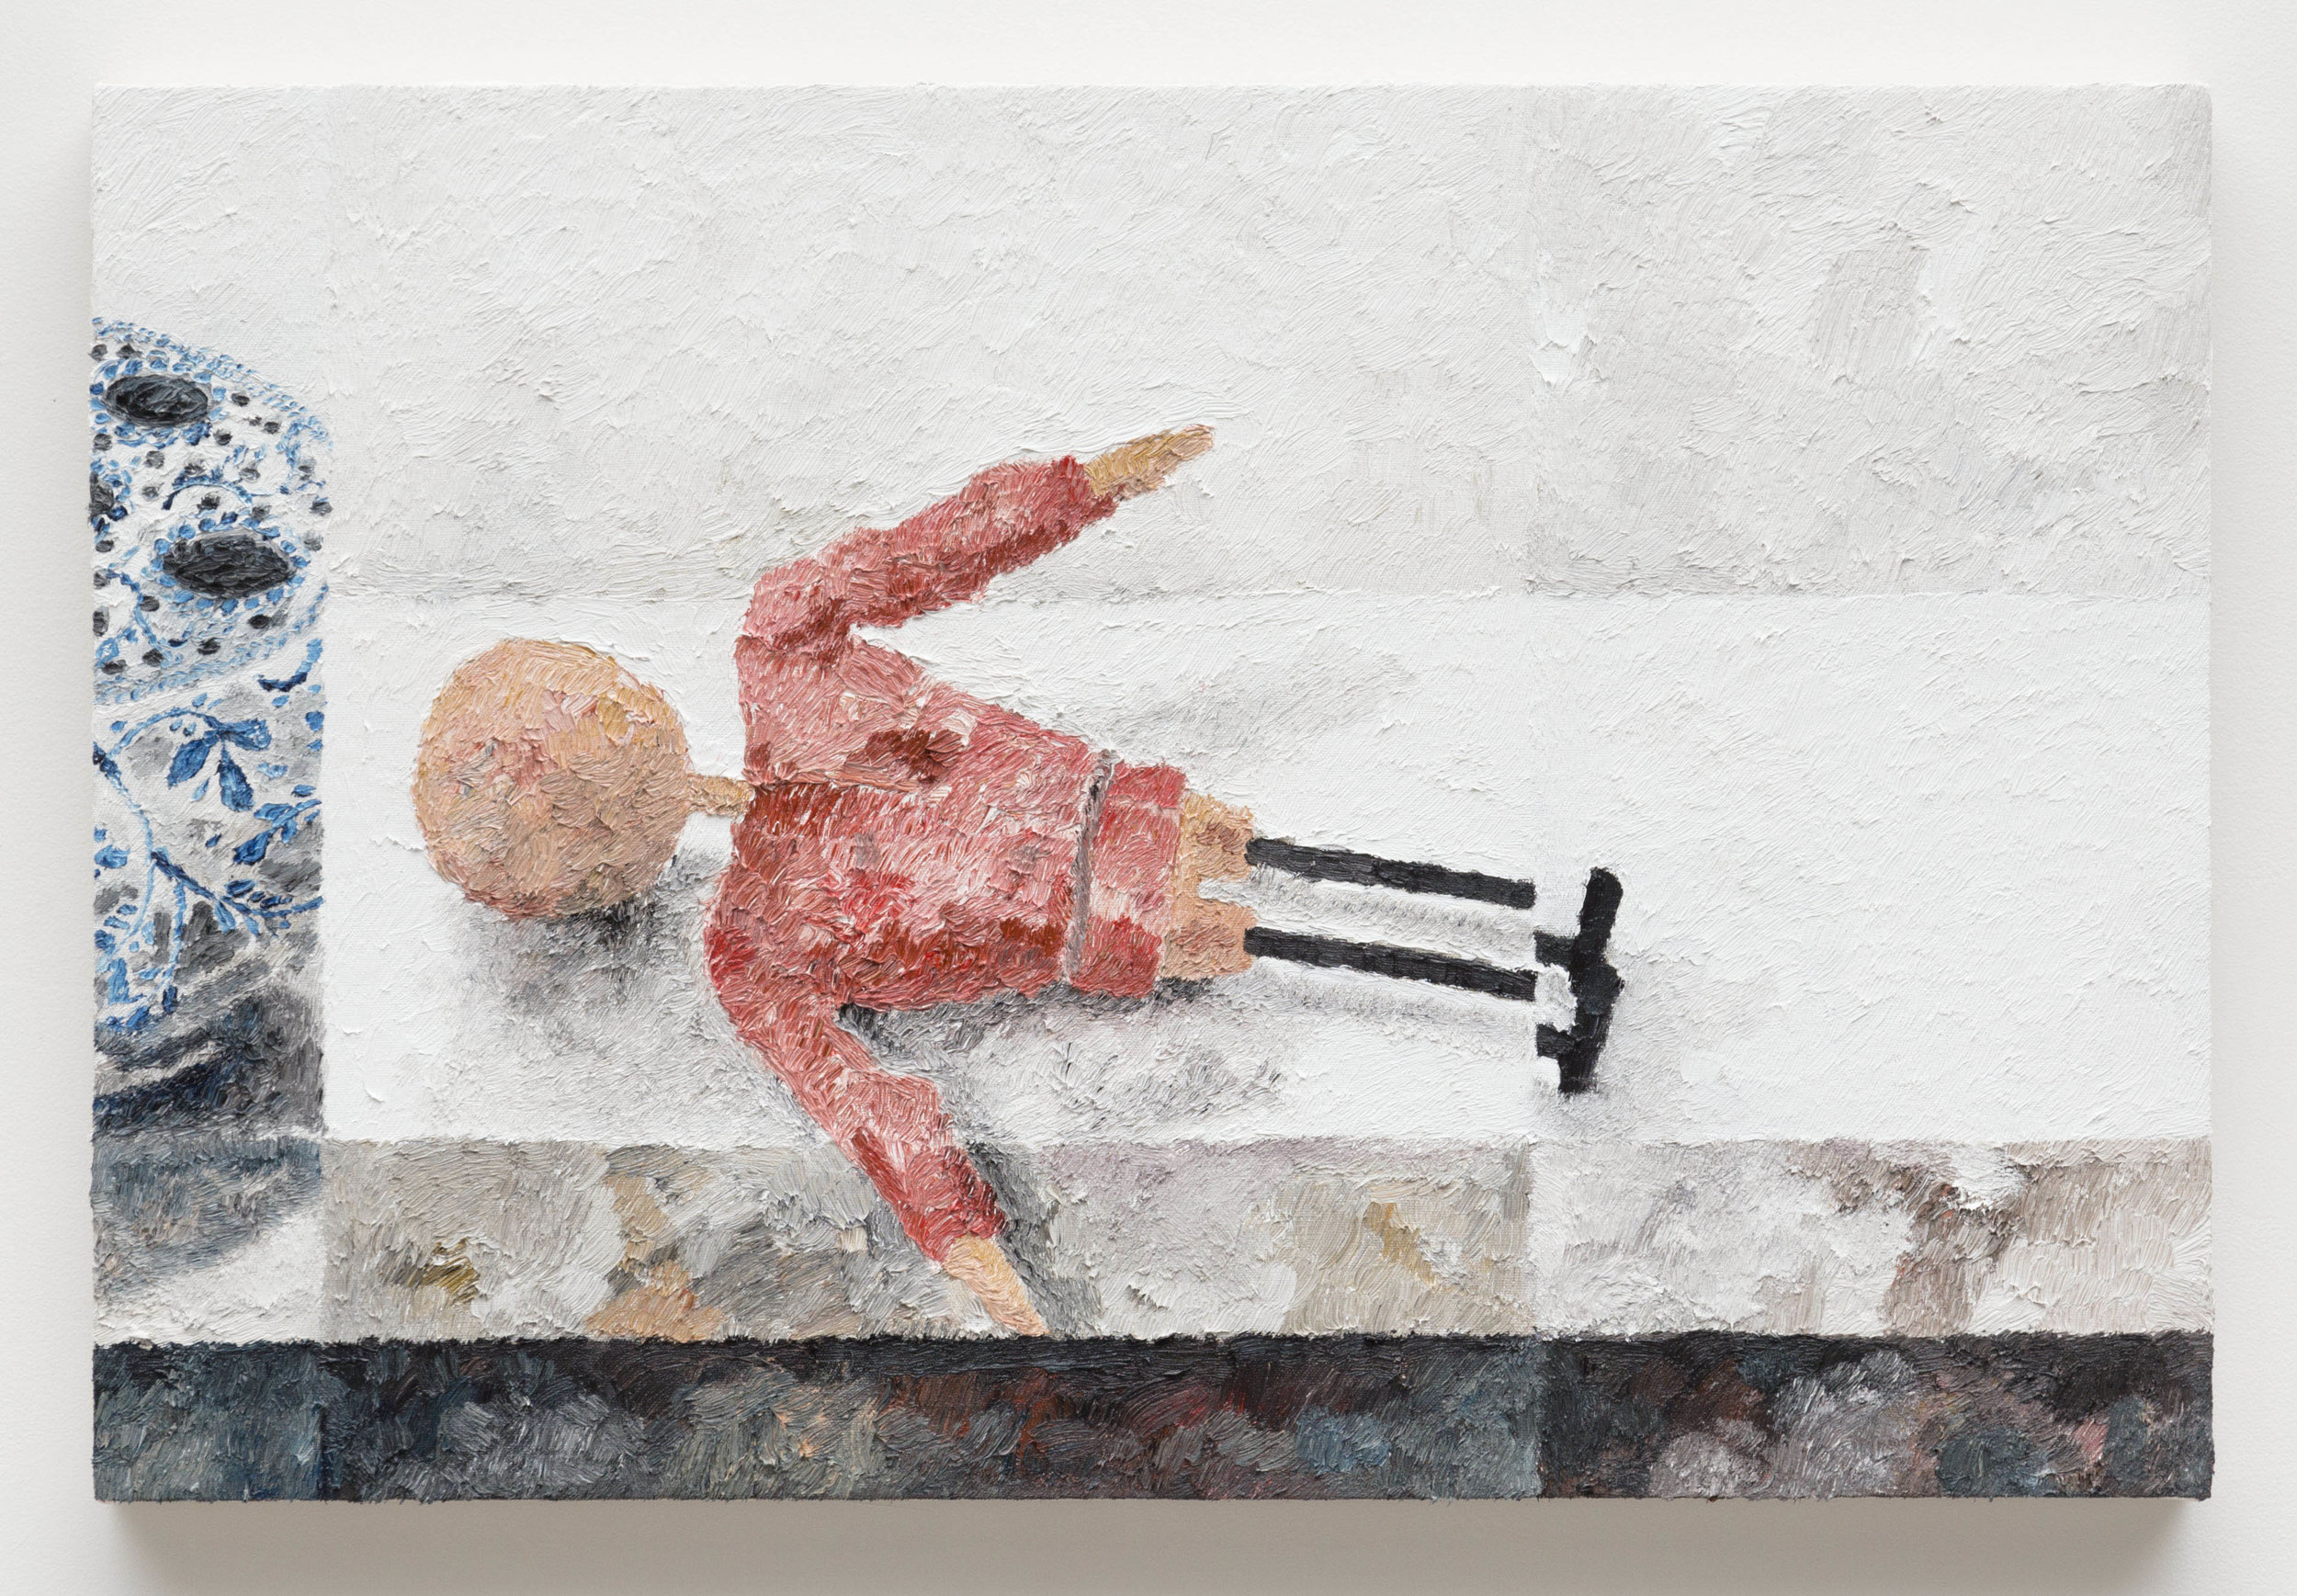 White Shelf, Broken Figure,  2017  Oil on canvas  20 x 30 inches